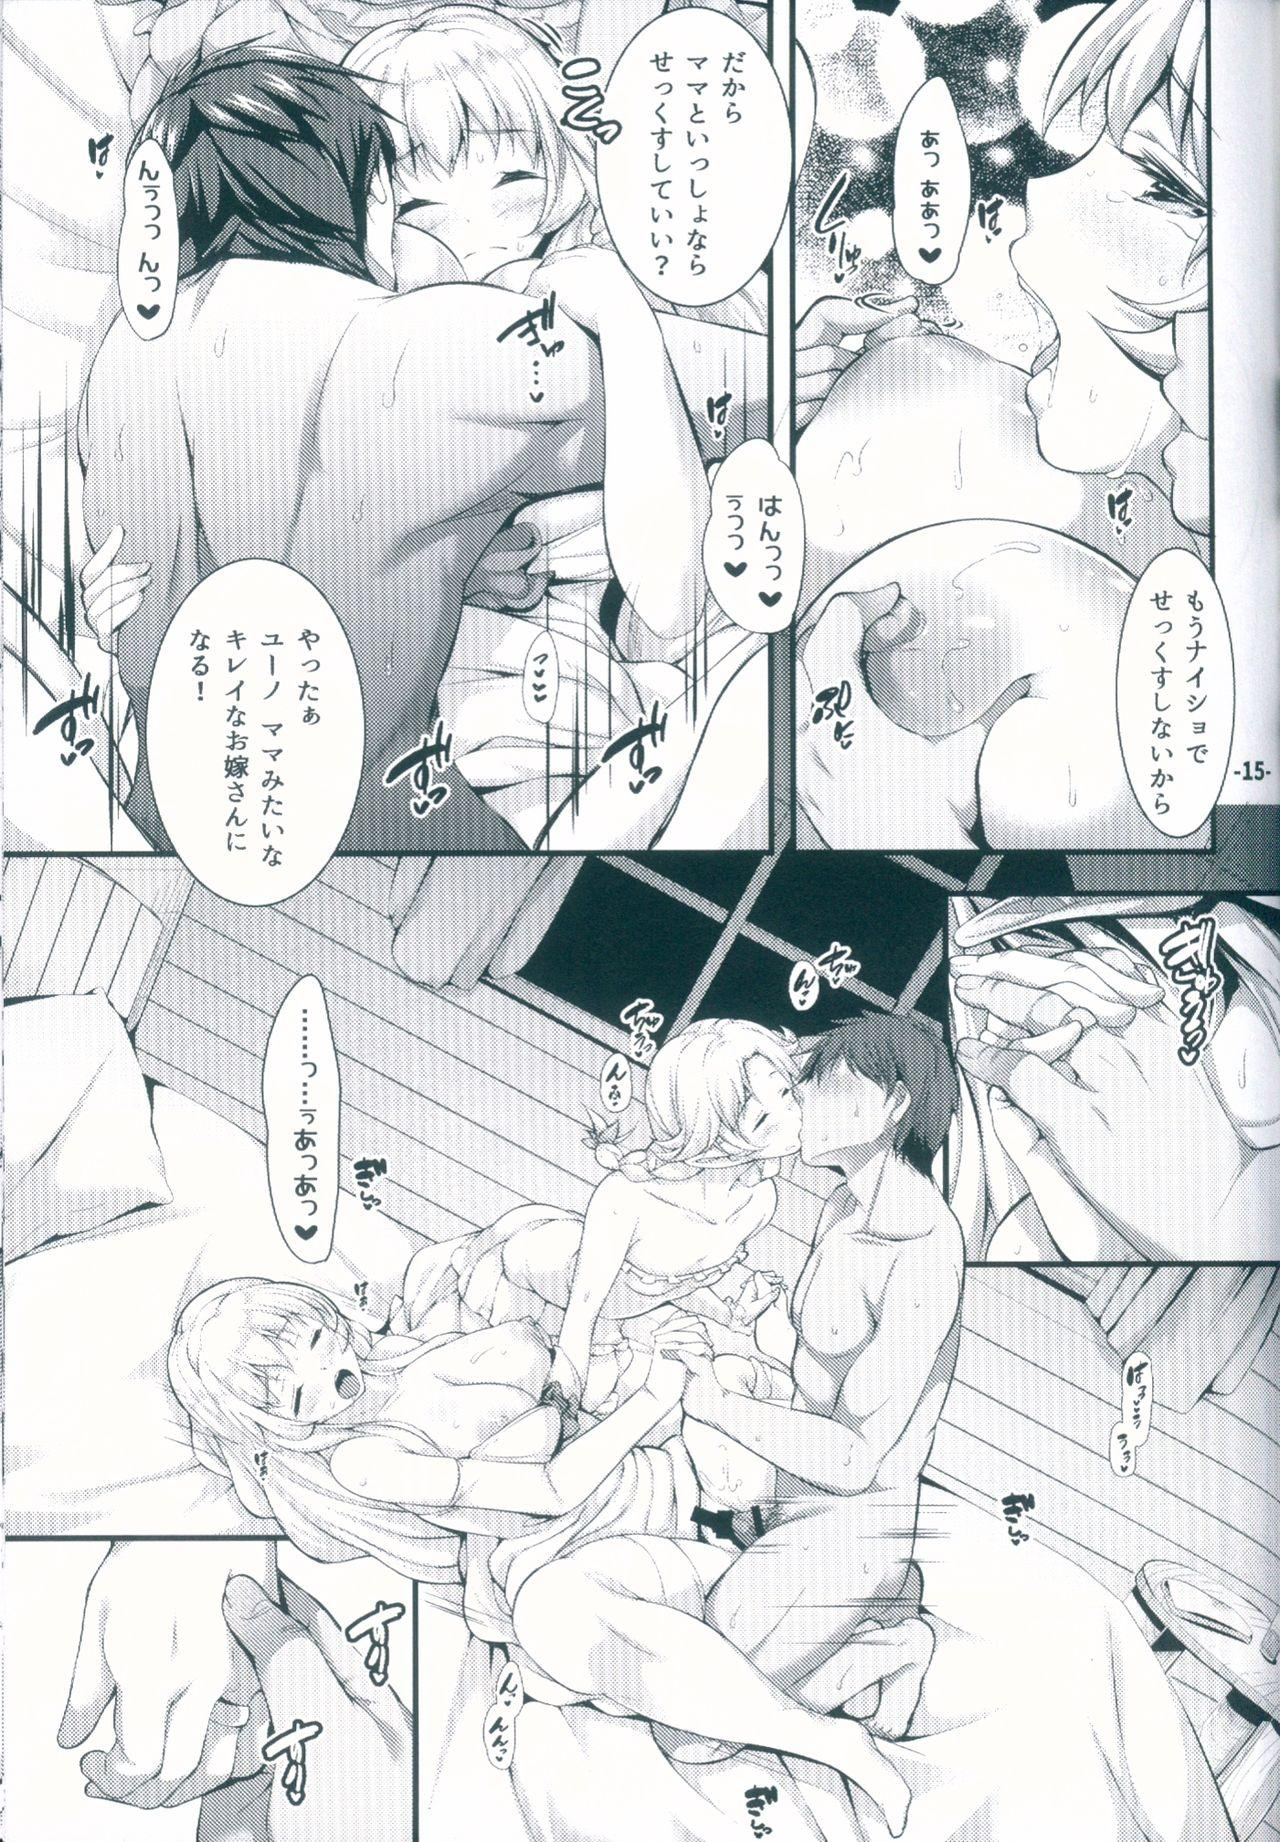 Isekai no Hanayome 14